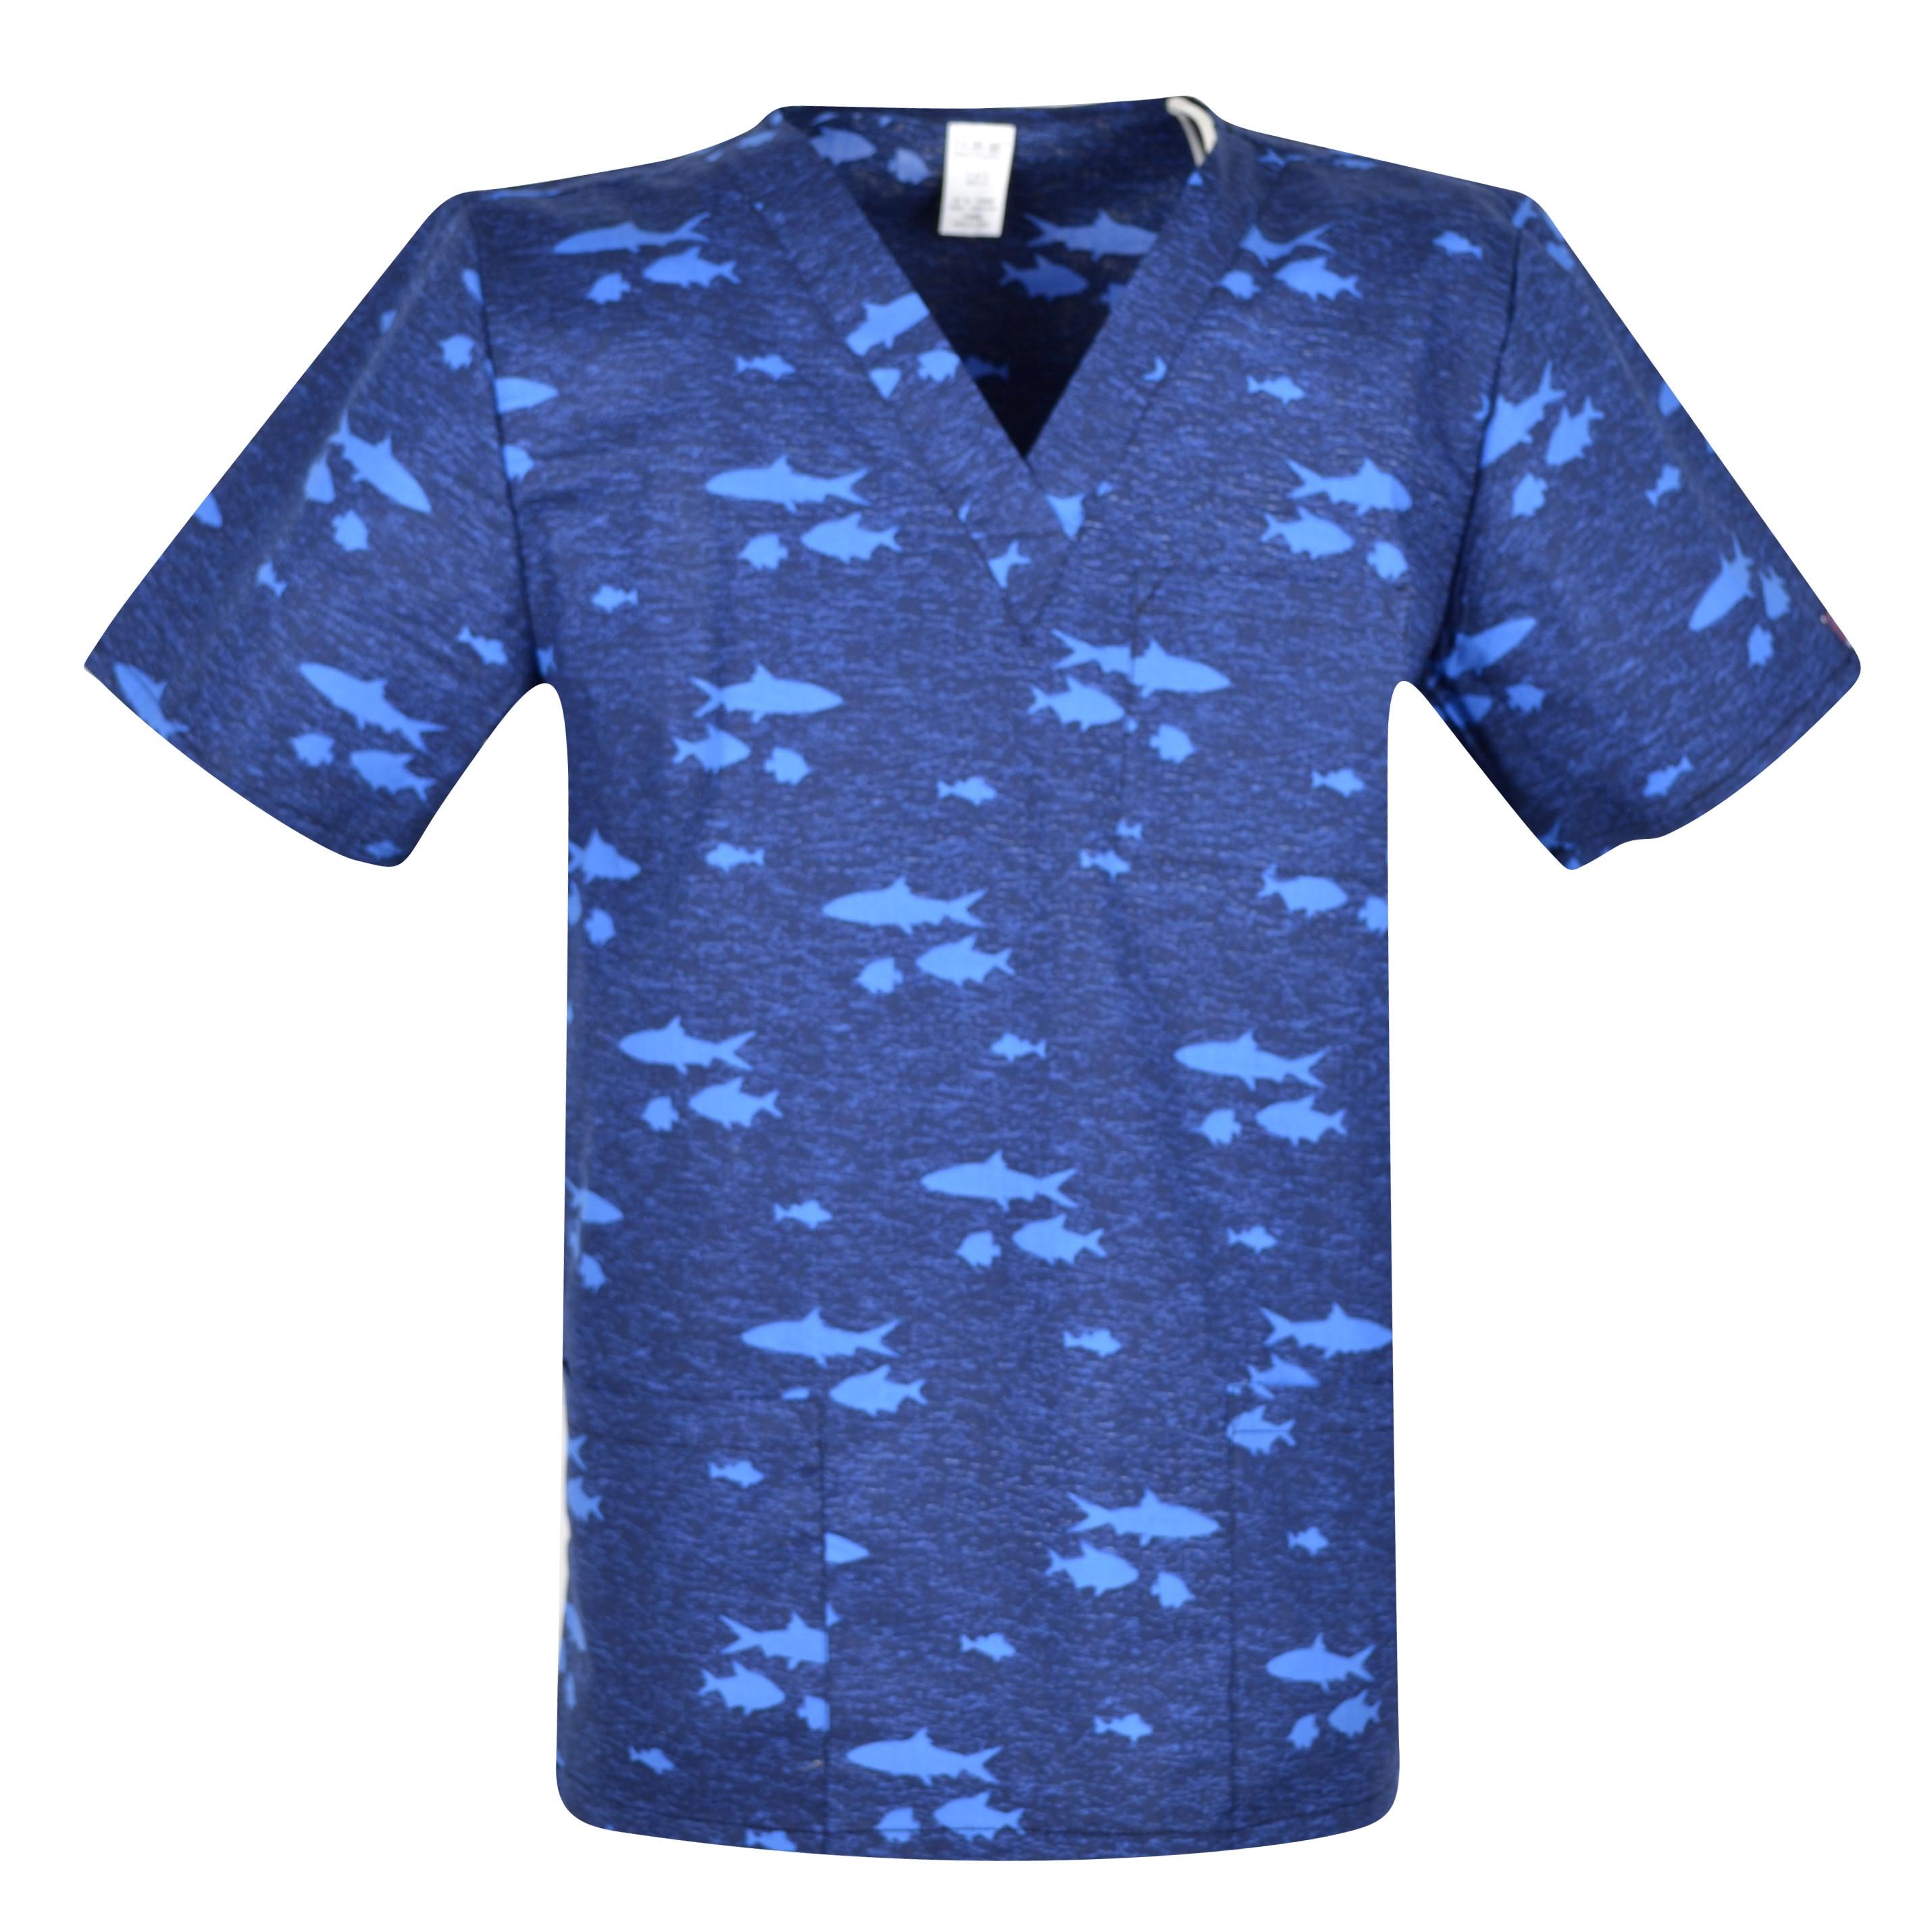 Print Men Medical Uniforms,men Scrub Top,men Medical Tops In  Camouflage Medical Uniform For Male In 100% Cotton